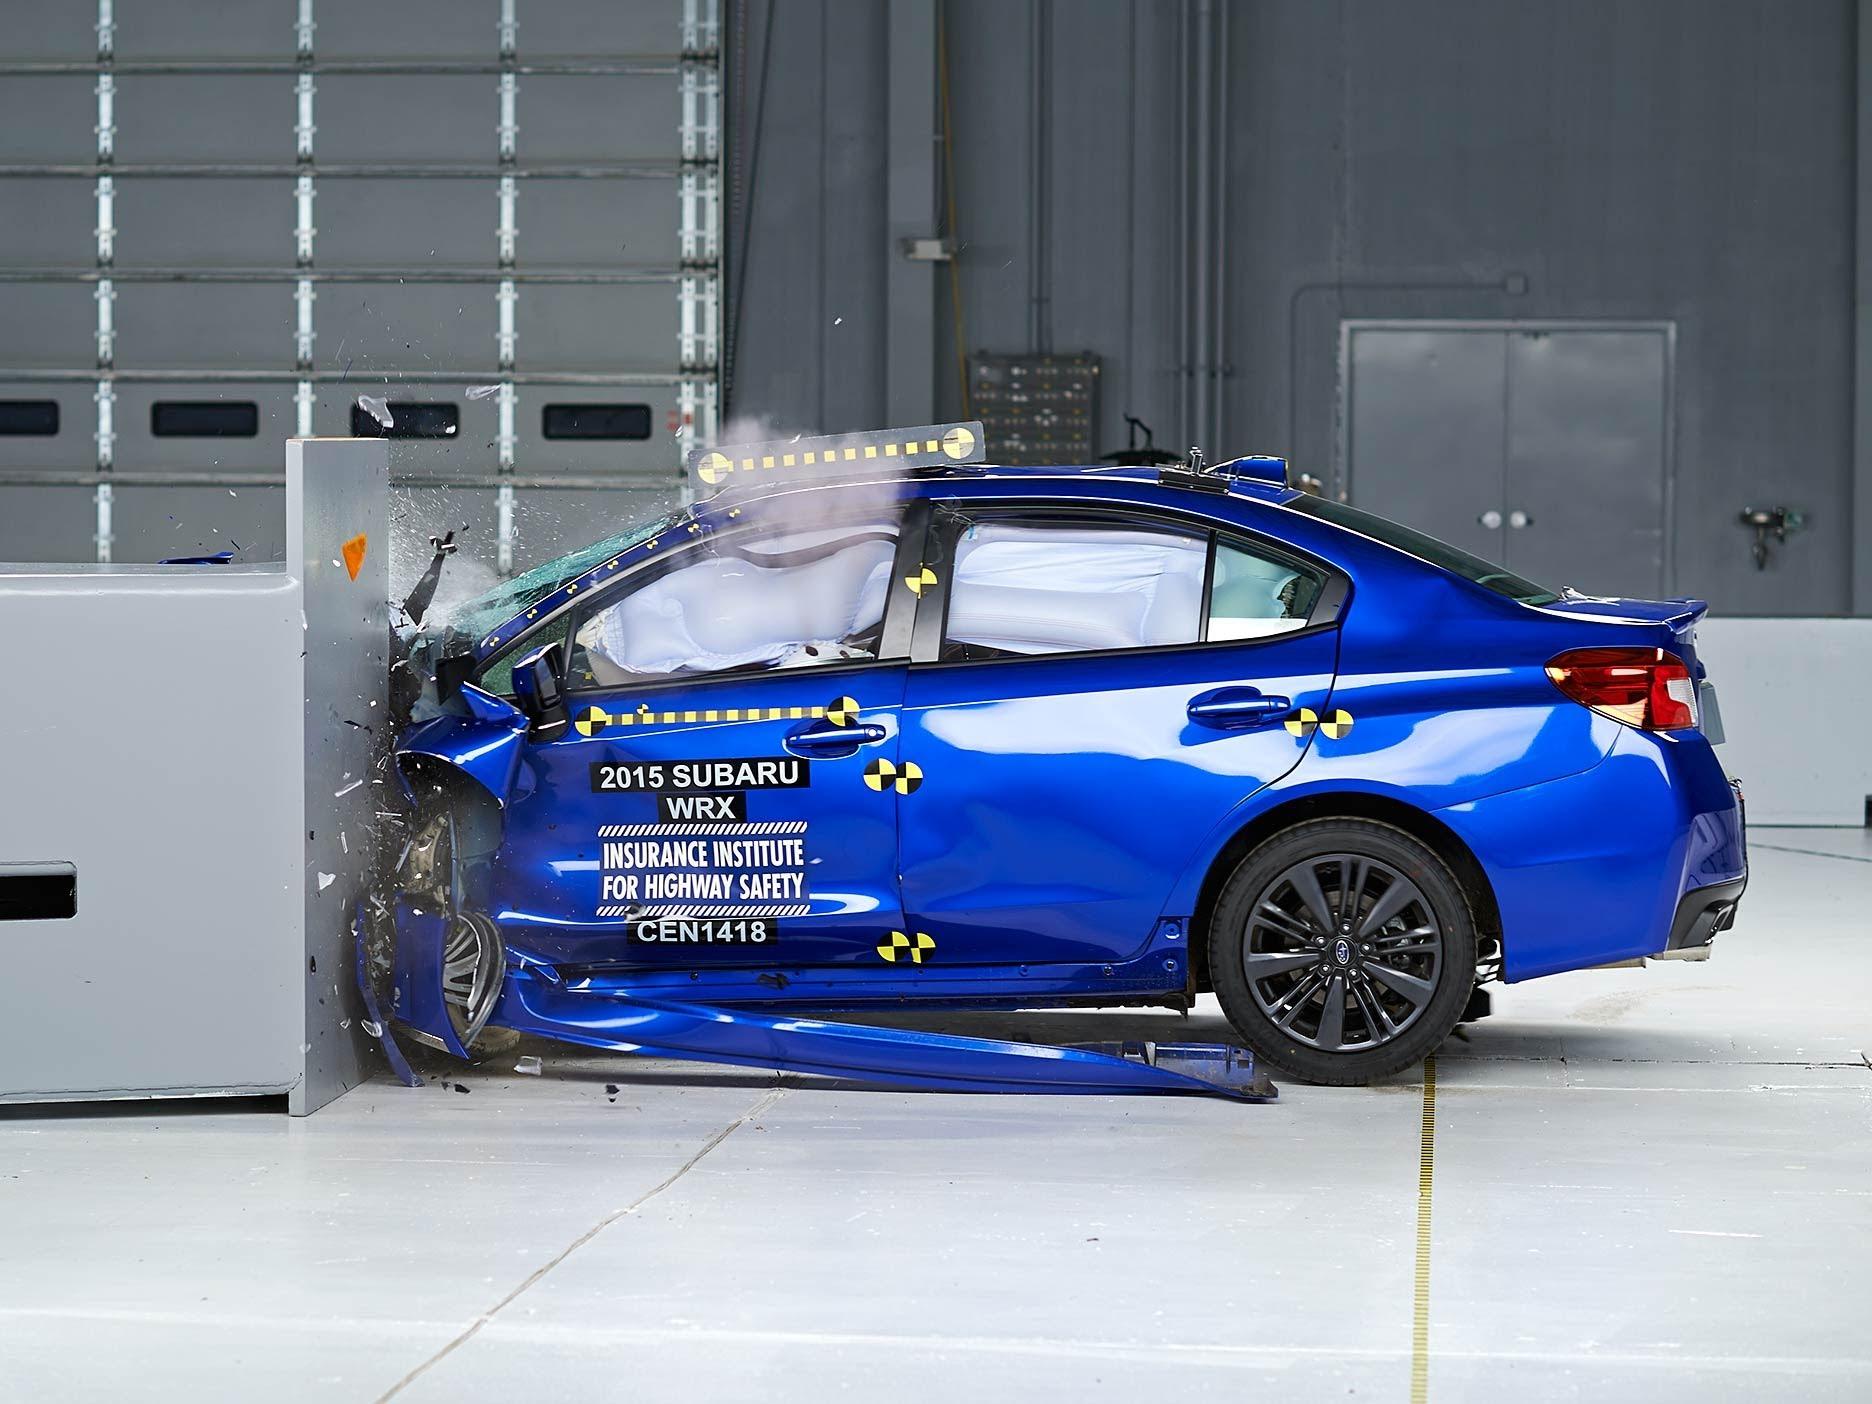 2015 Subaru WRX small overlap IIHS crash test